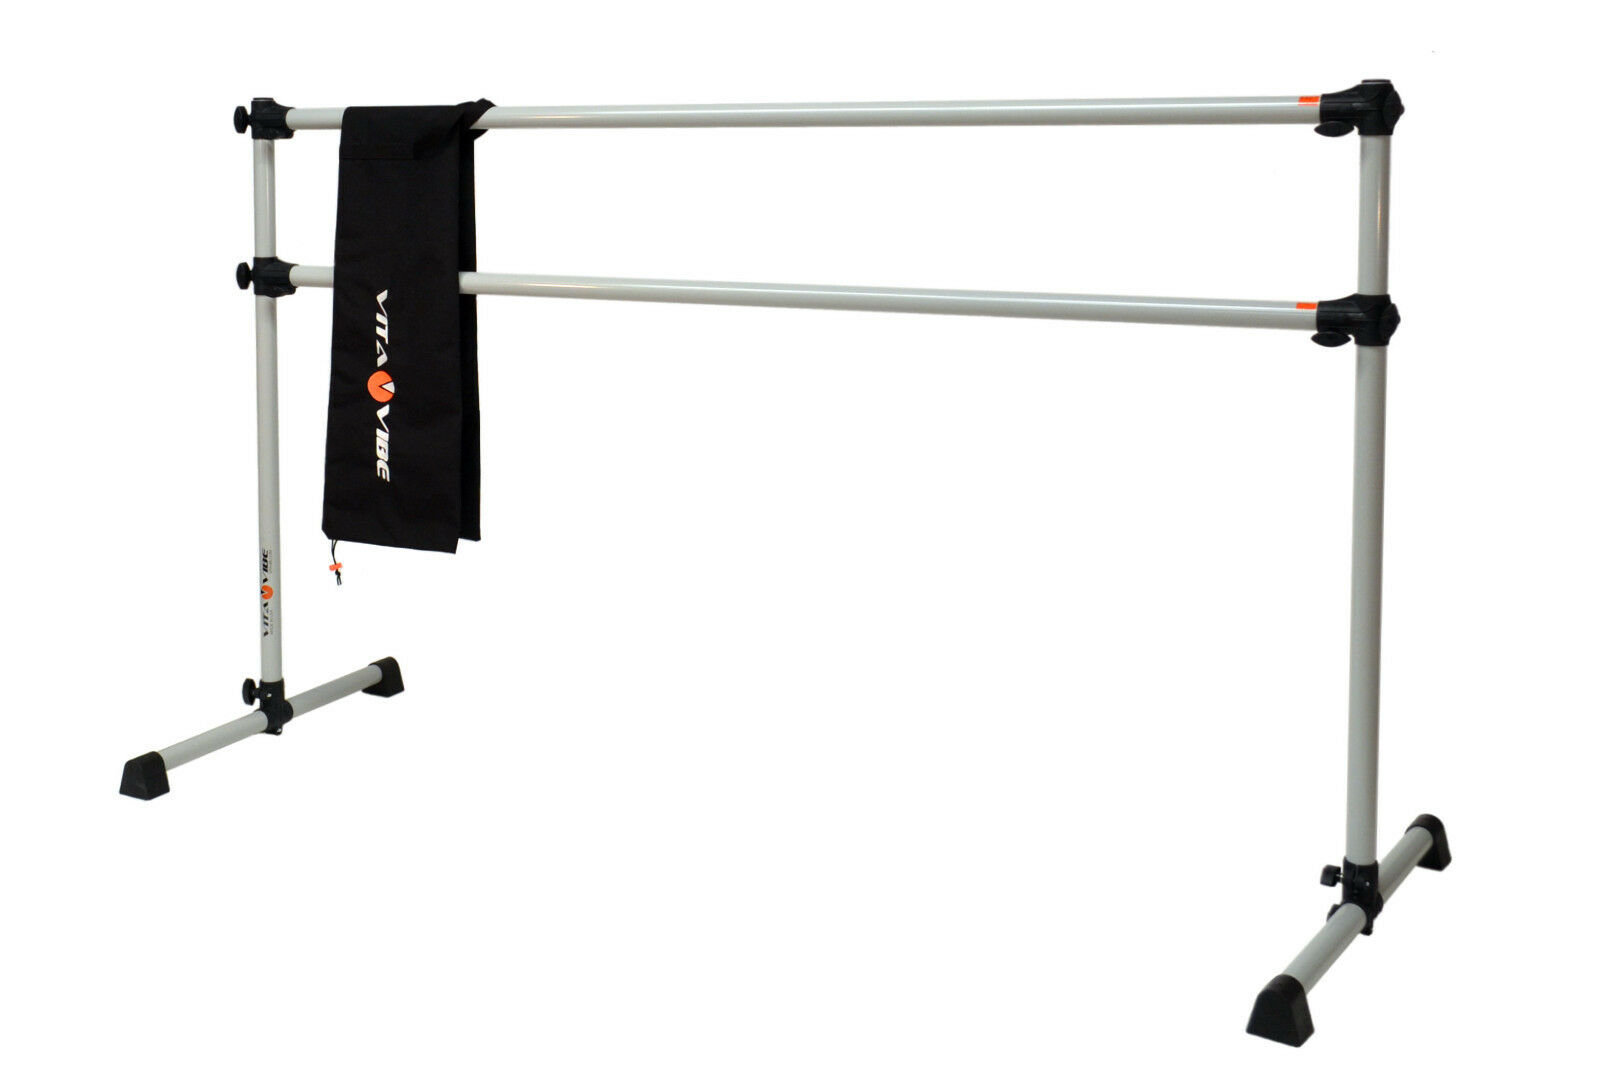 Ballet Barre DBNB 5 5 FT (environ 1.52 m) Portable Double Barre avec Sac-Stretch Dance Bar-NEUF